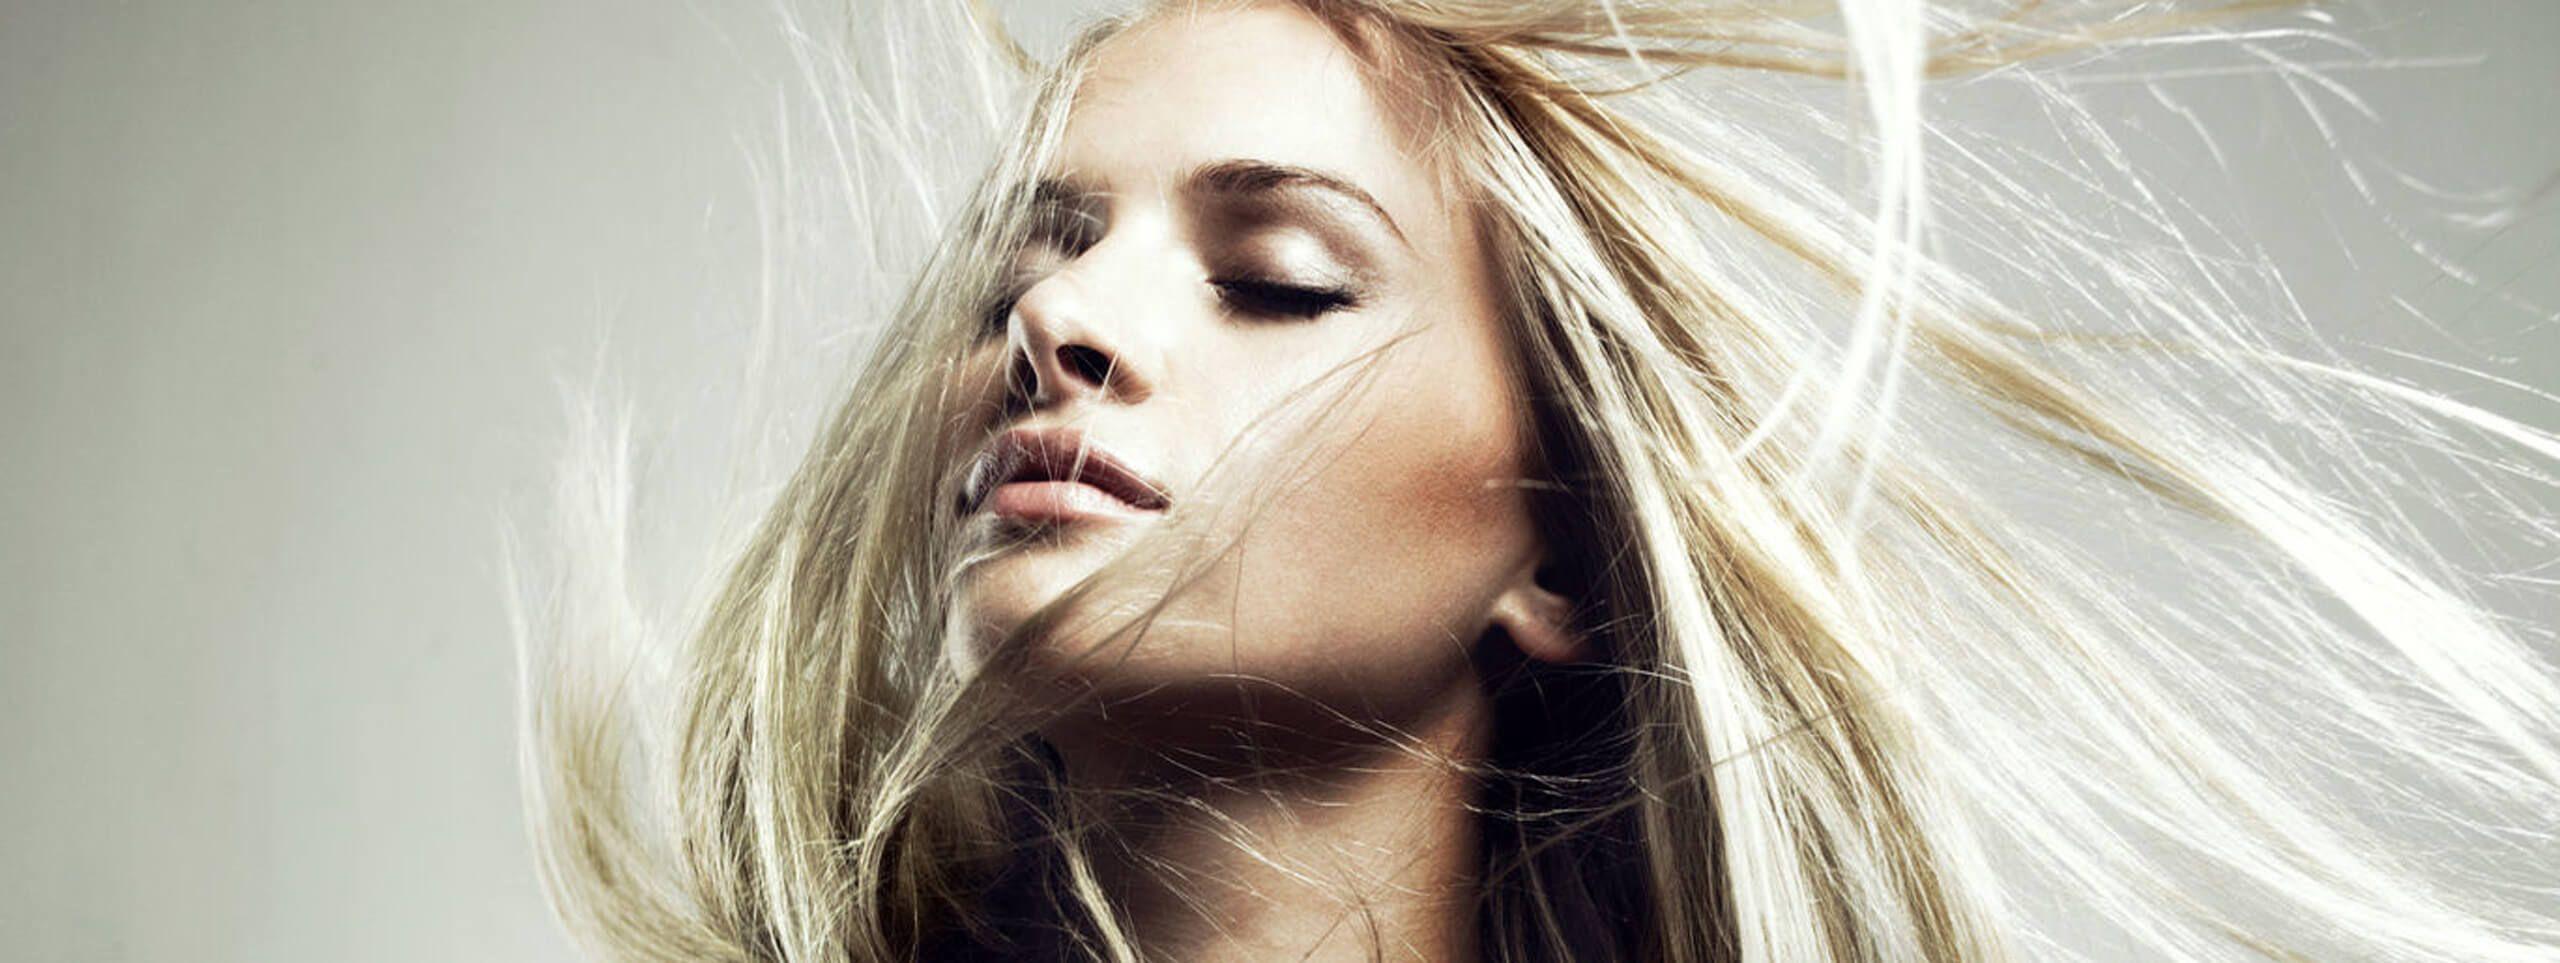 Woman with blonde medium-length hair